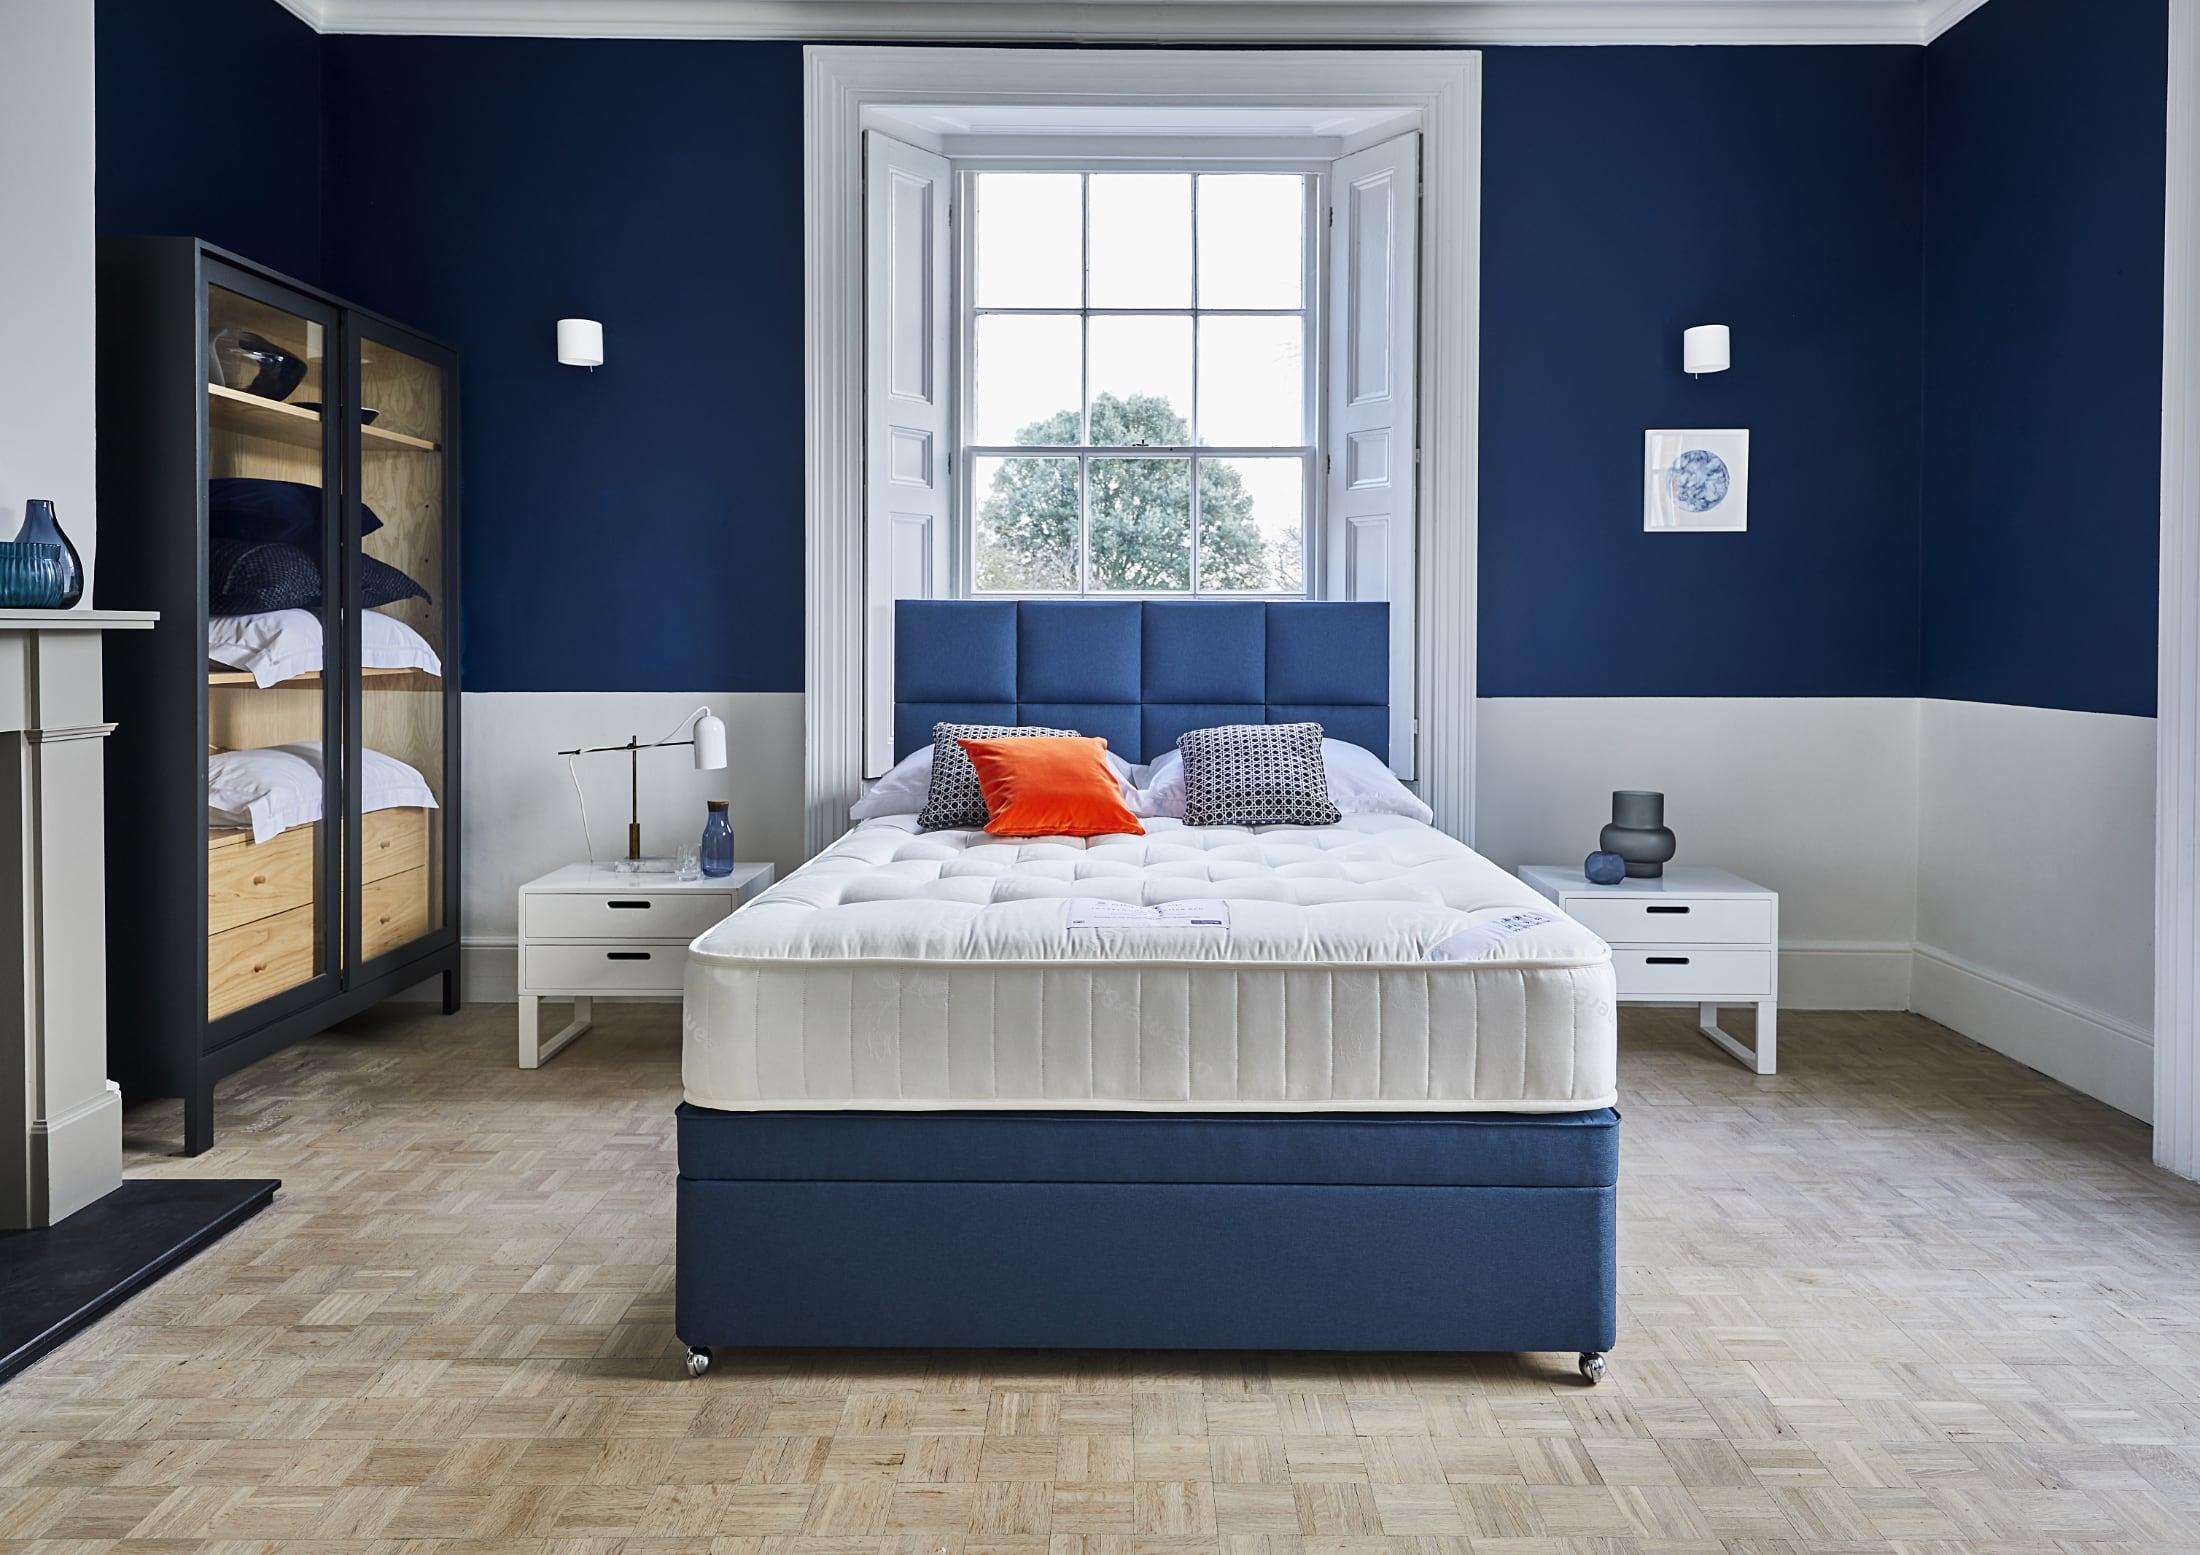 15% off Sleepeezee Travelodge mattress